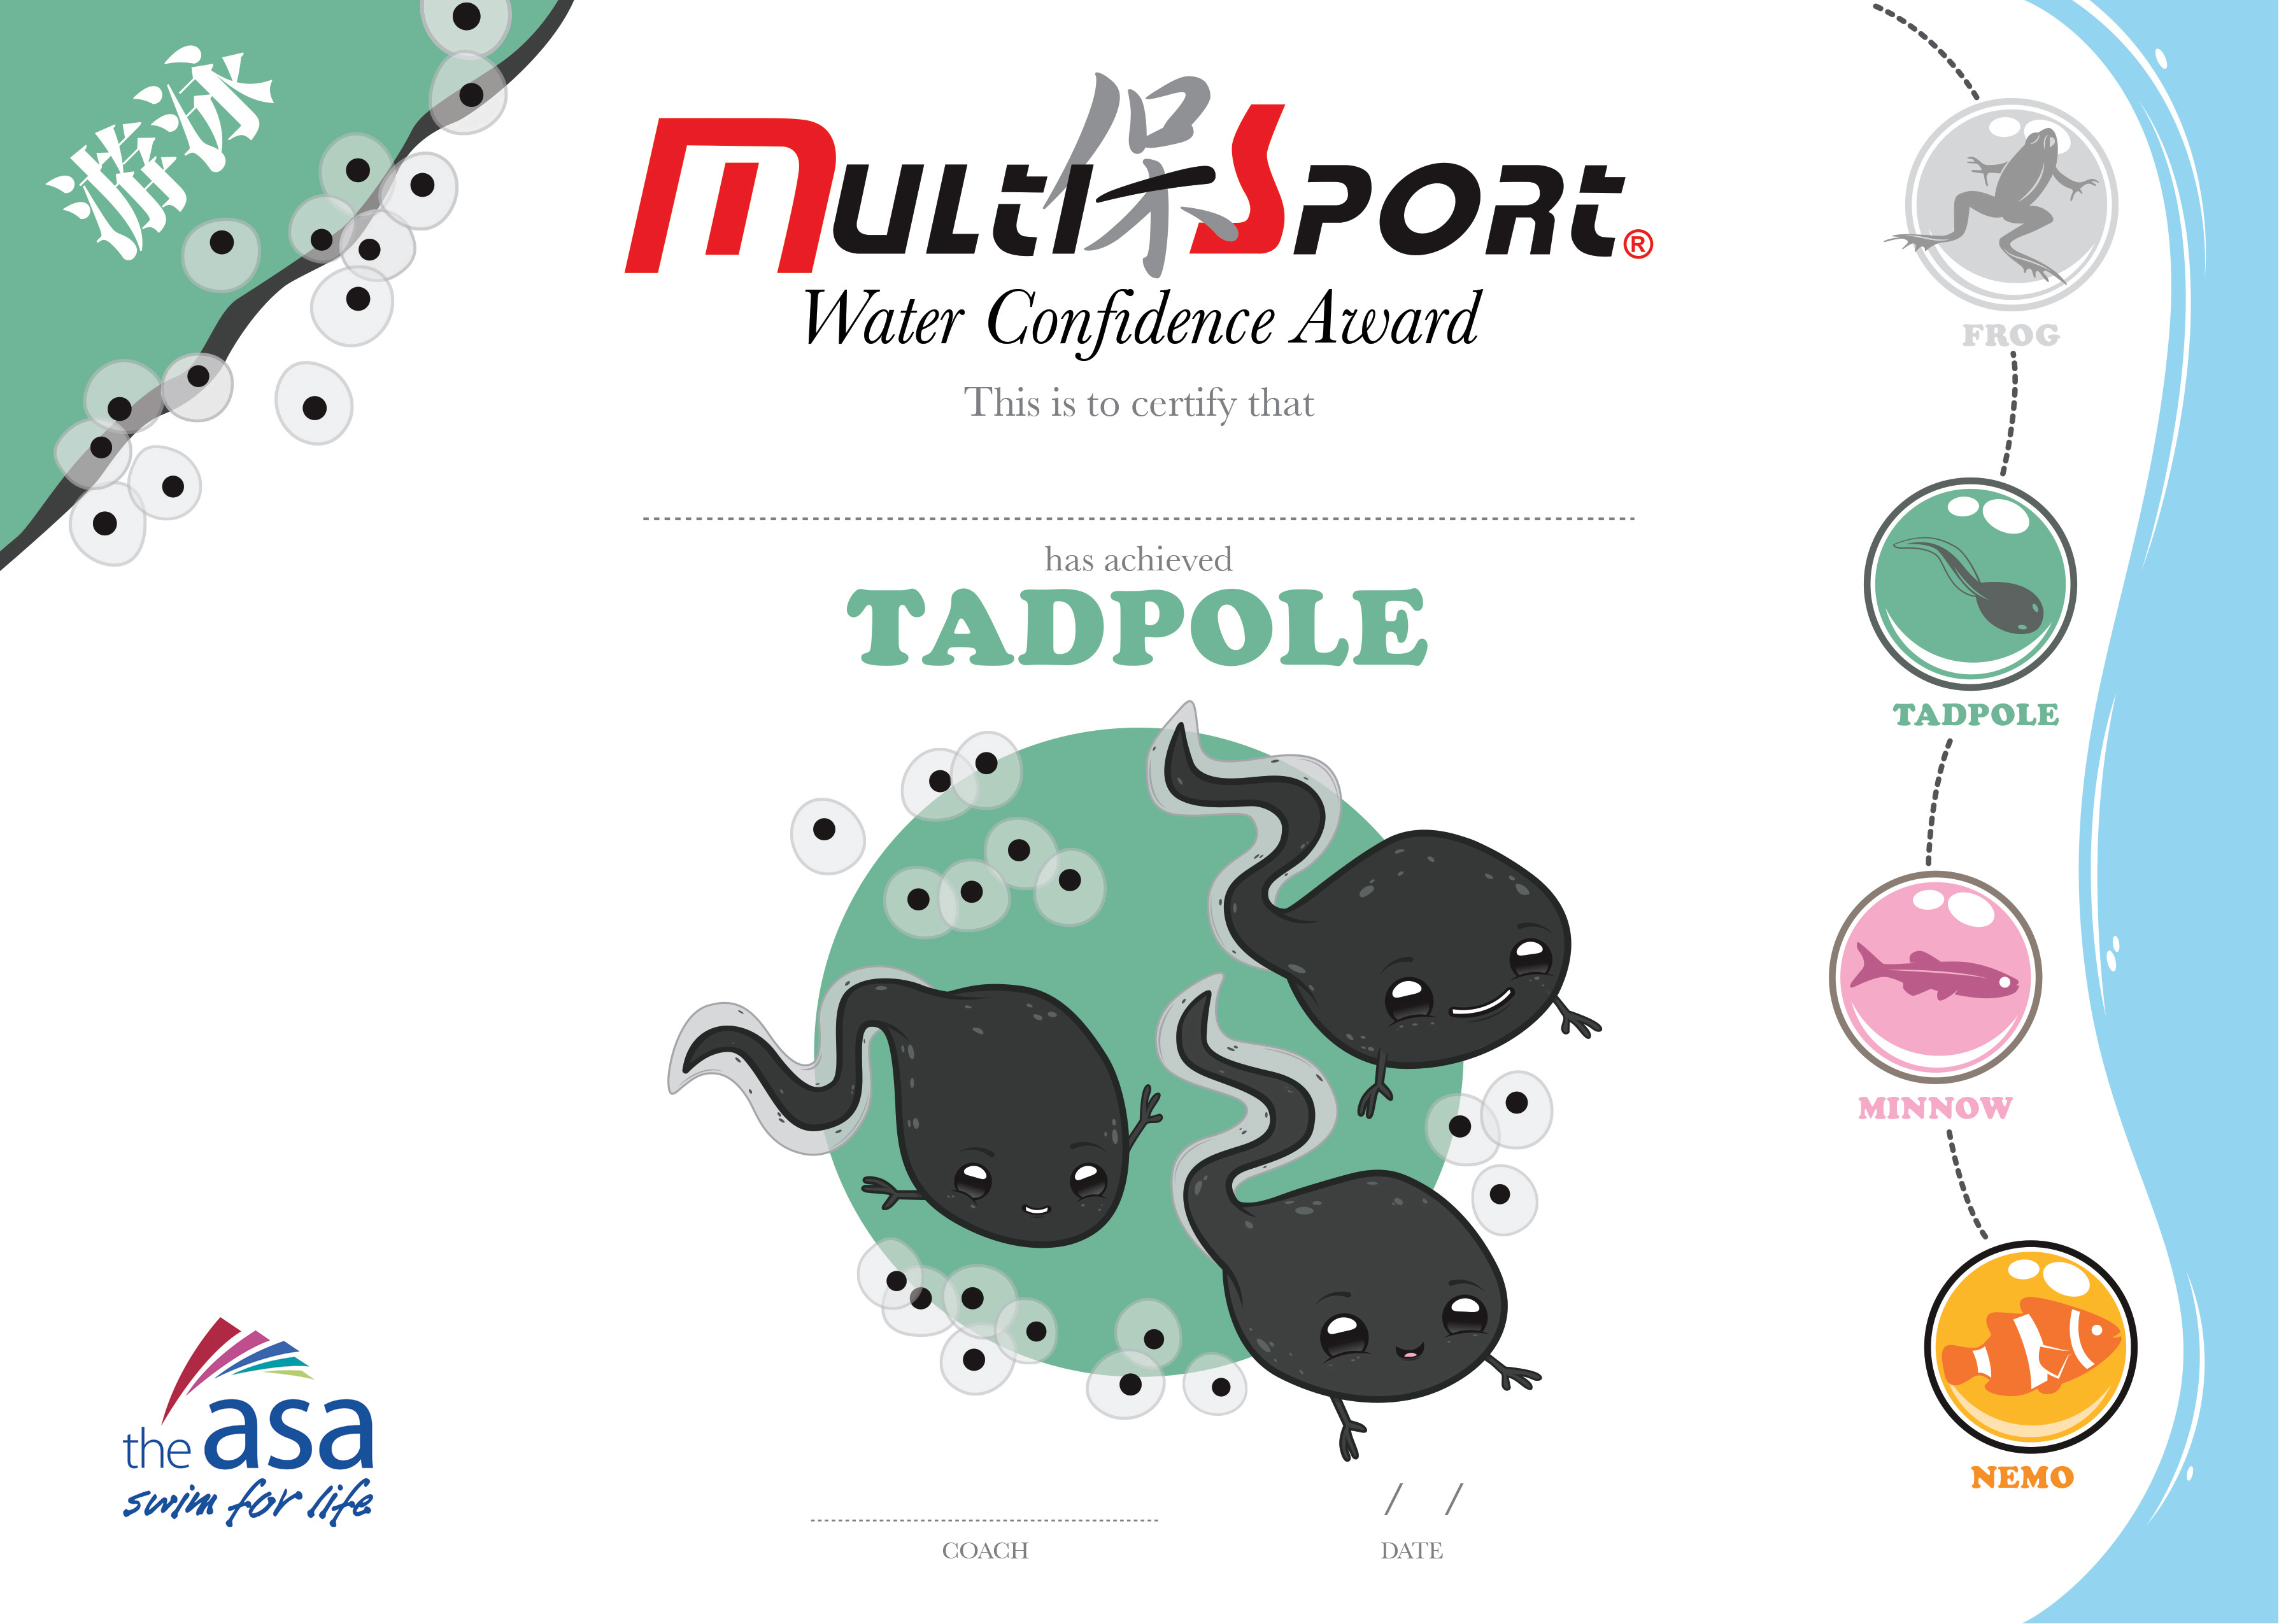 MULTISPORT(tadpole)